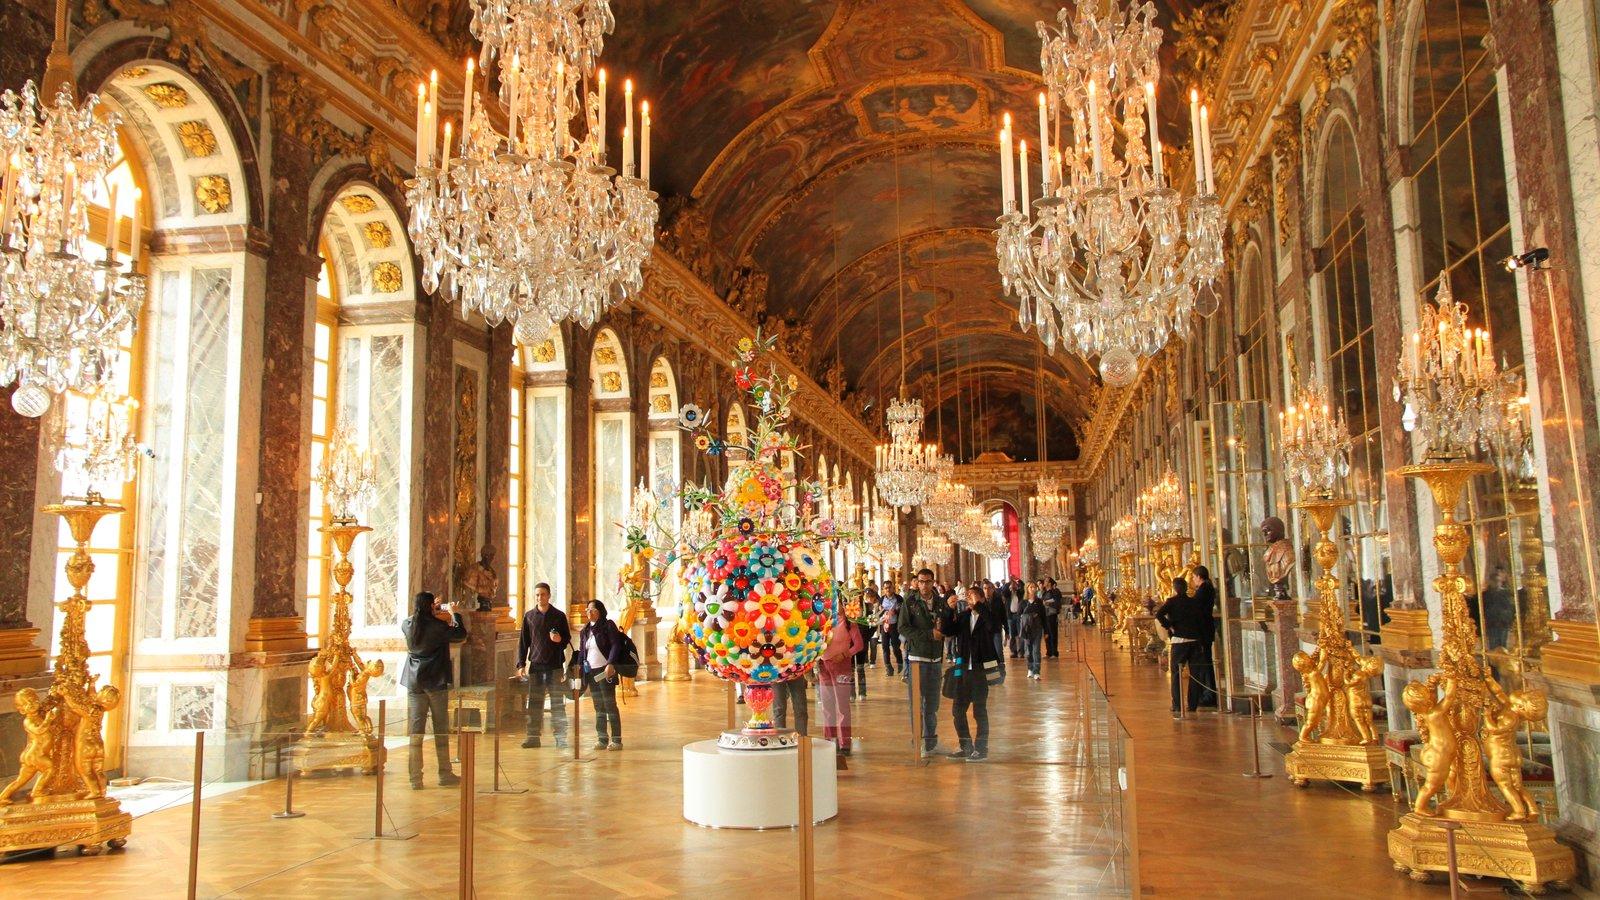 Paris caracterizando vistas internas e arquitetura de patrimônio